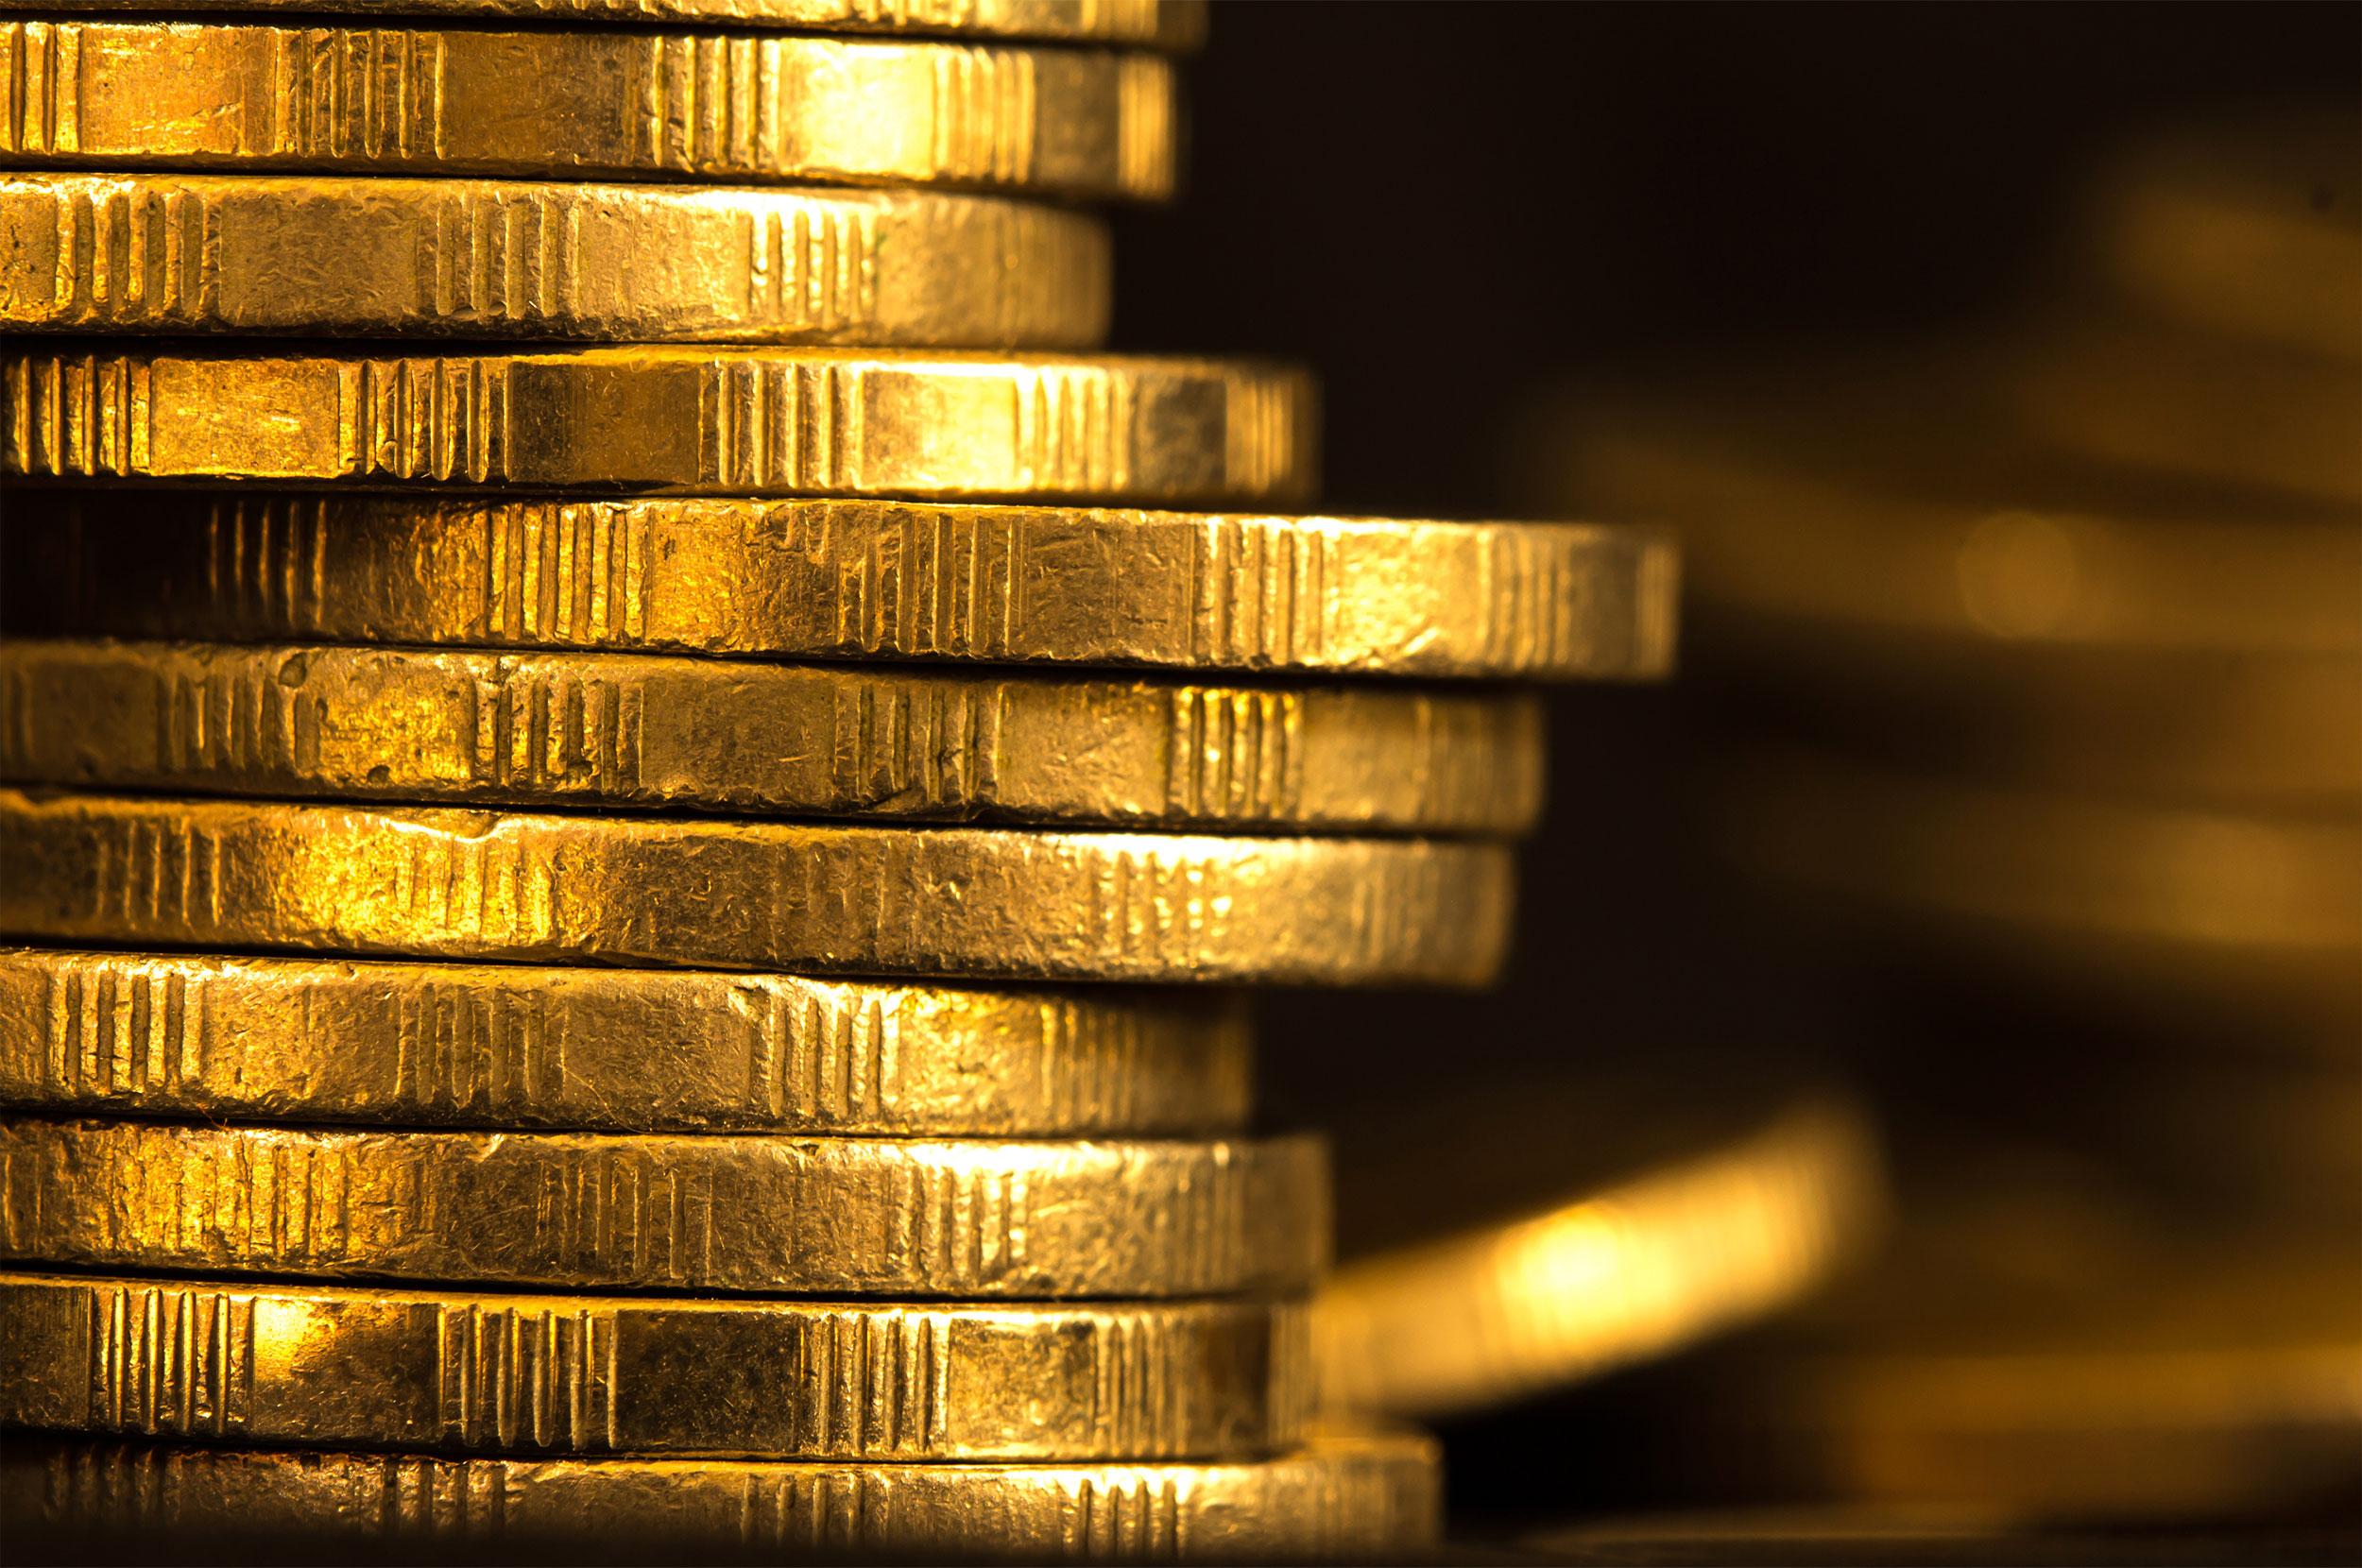 https://www.goldmoney.com/images/media/Images/Articles/Headers/Custom/prices-money.jpg